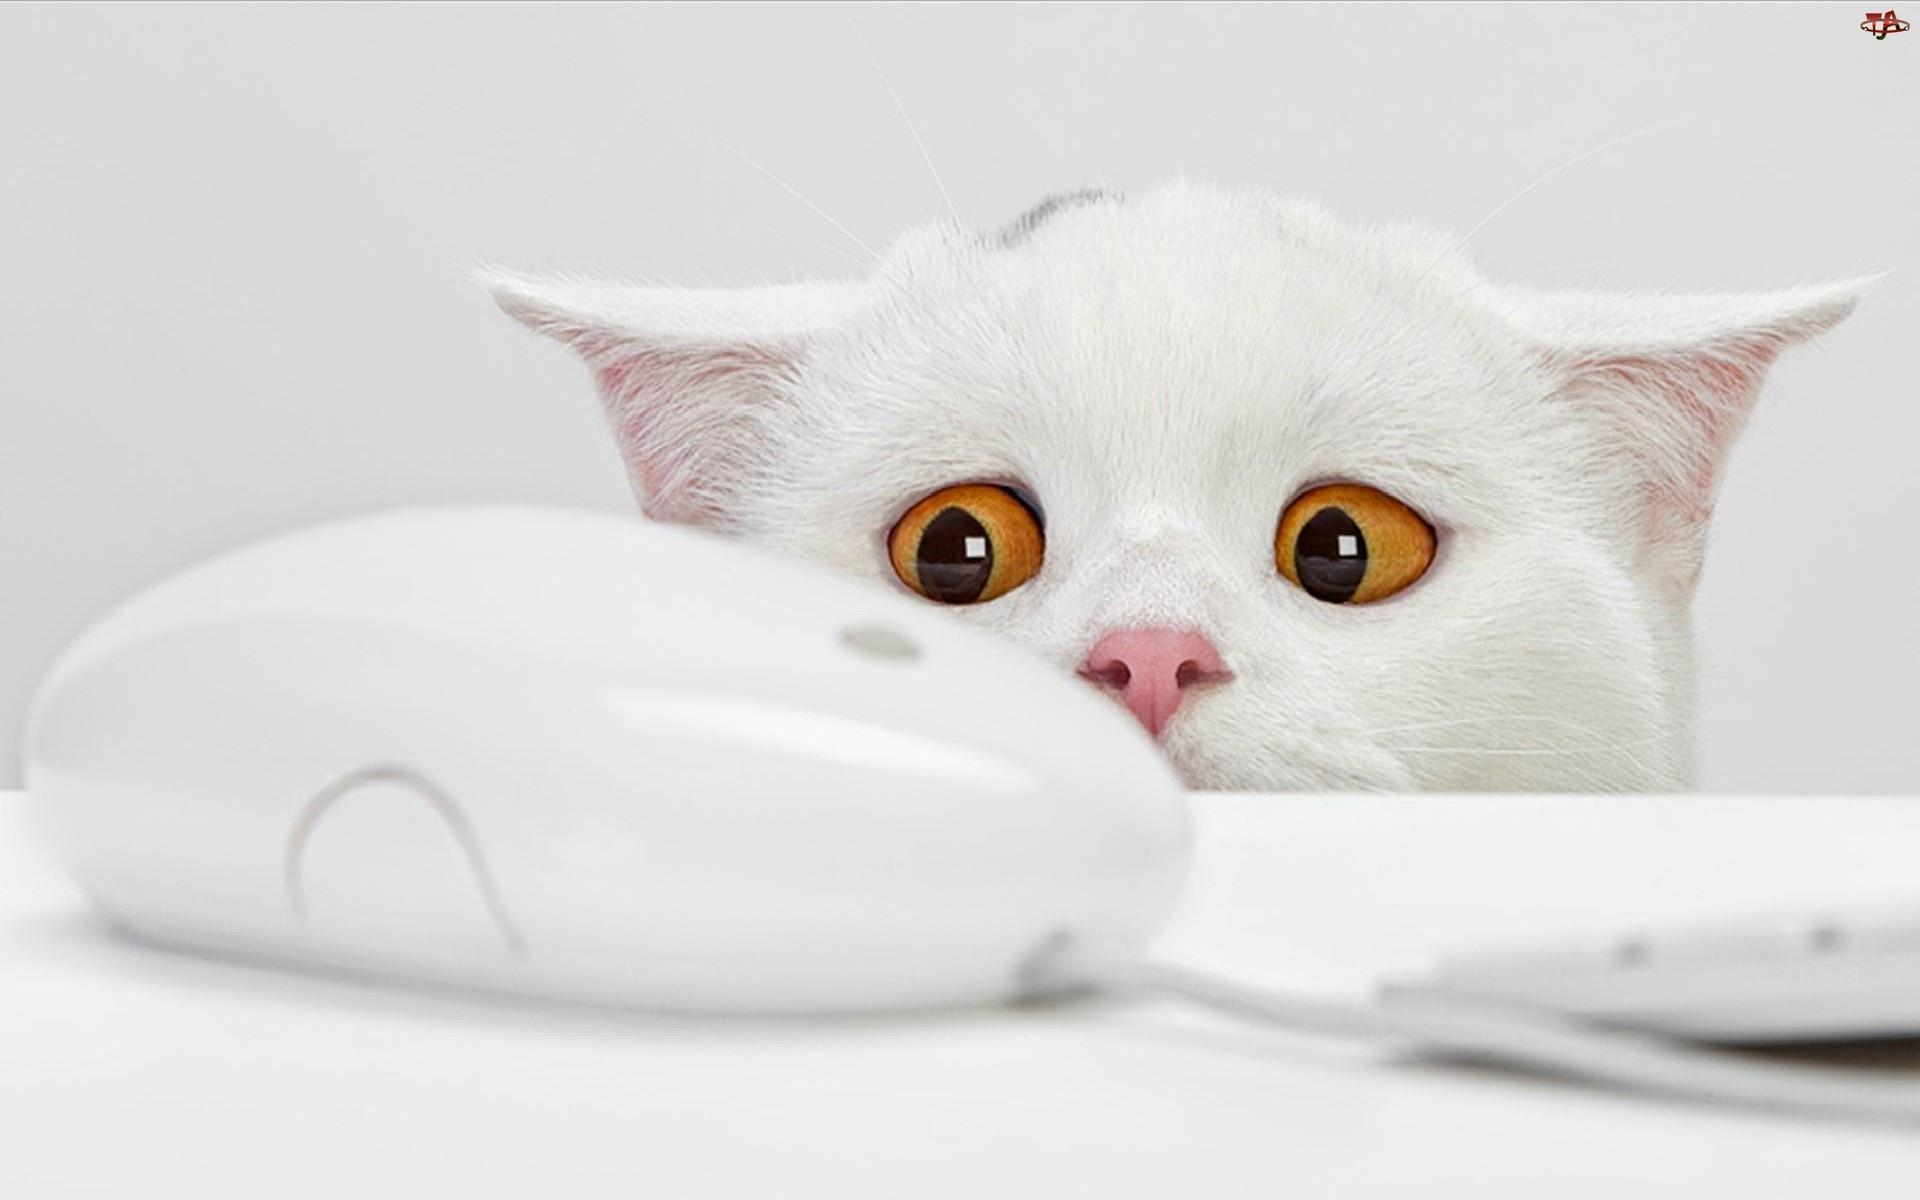 Komputerowa, Kot, Myszka